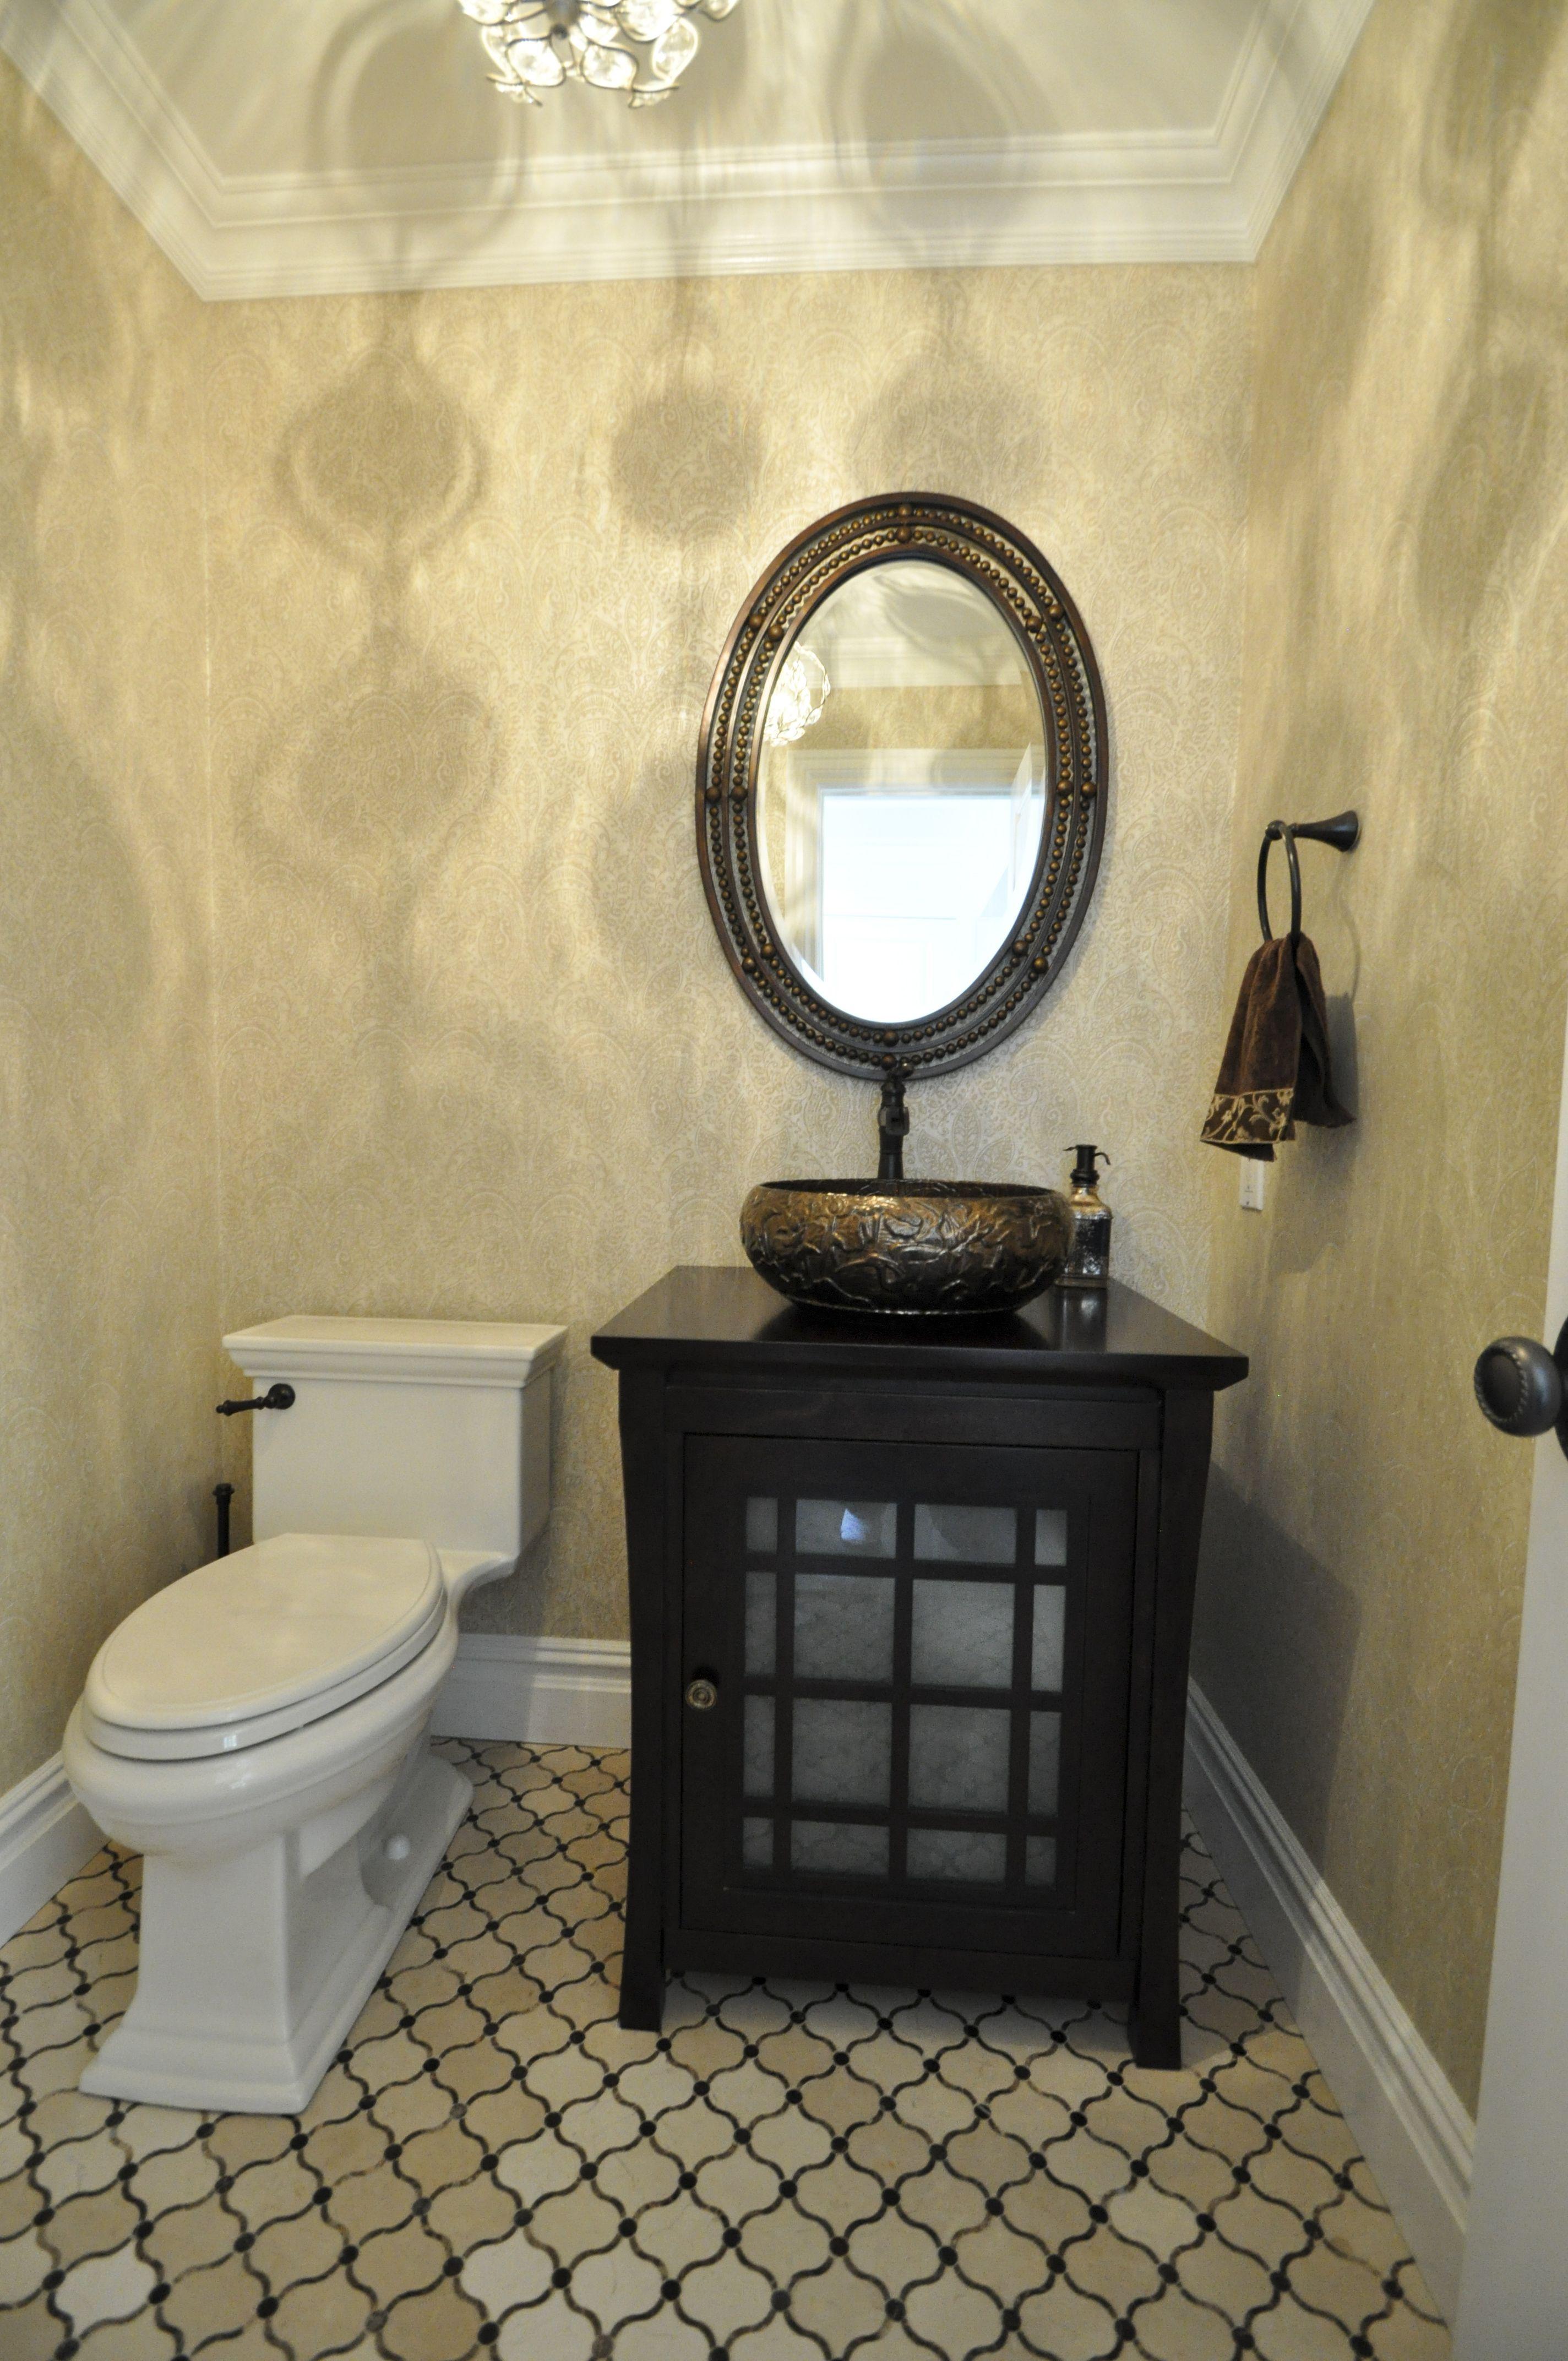 1/2 Bathroom with marble floor, wallpaper walls, single crown